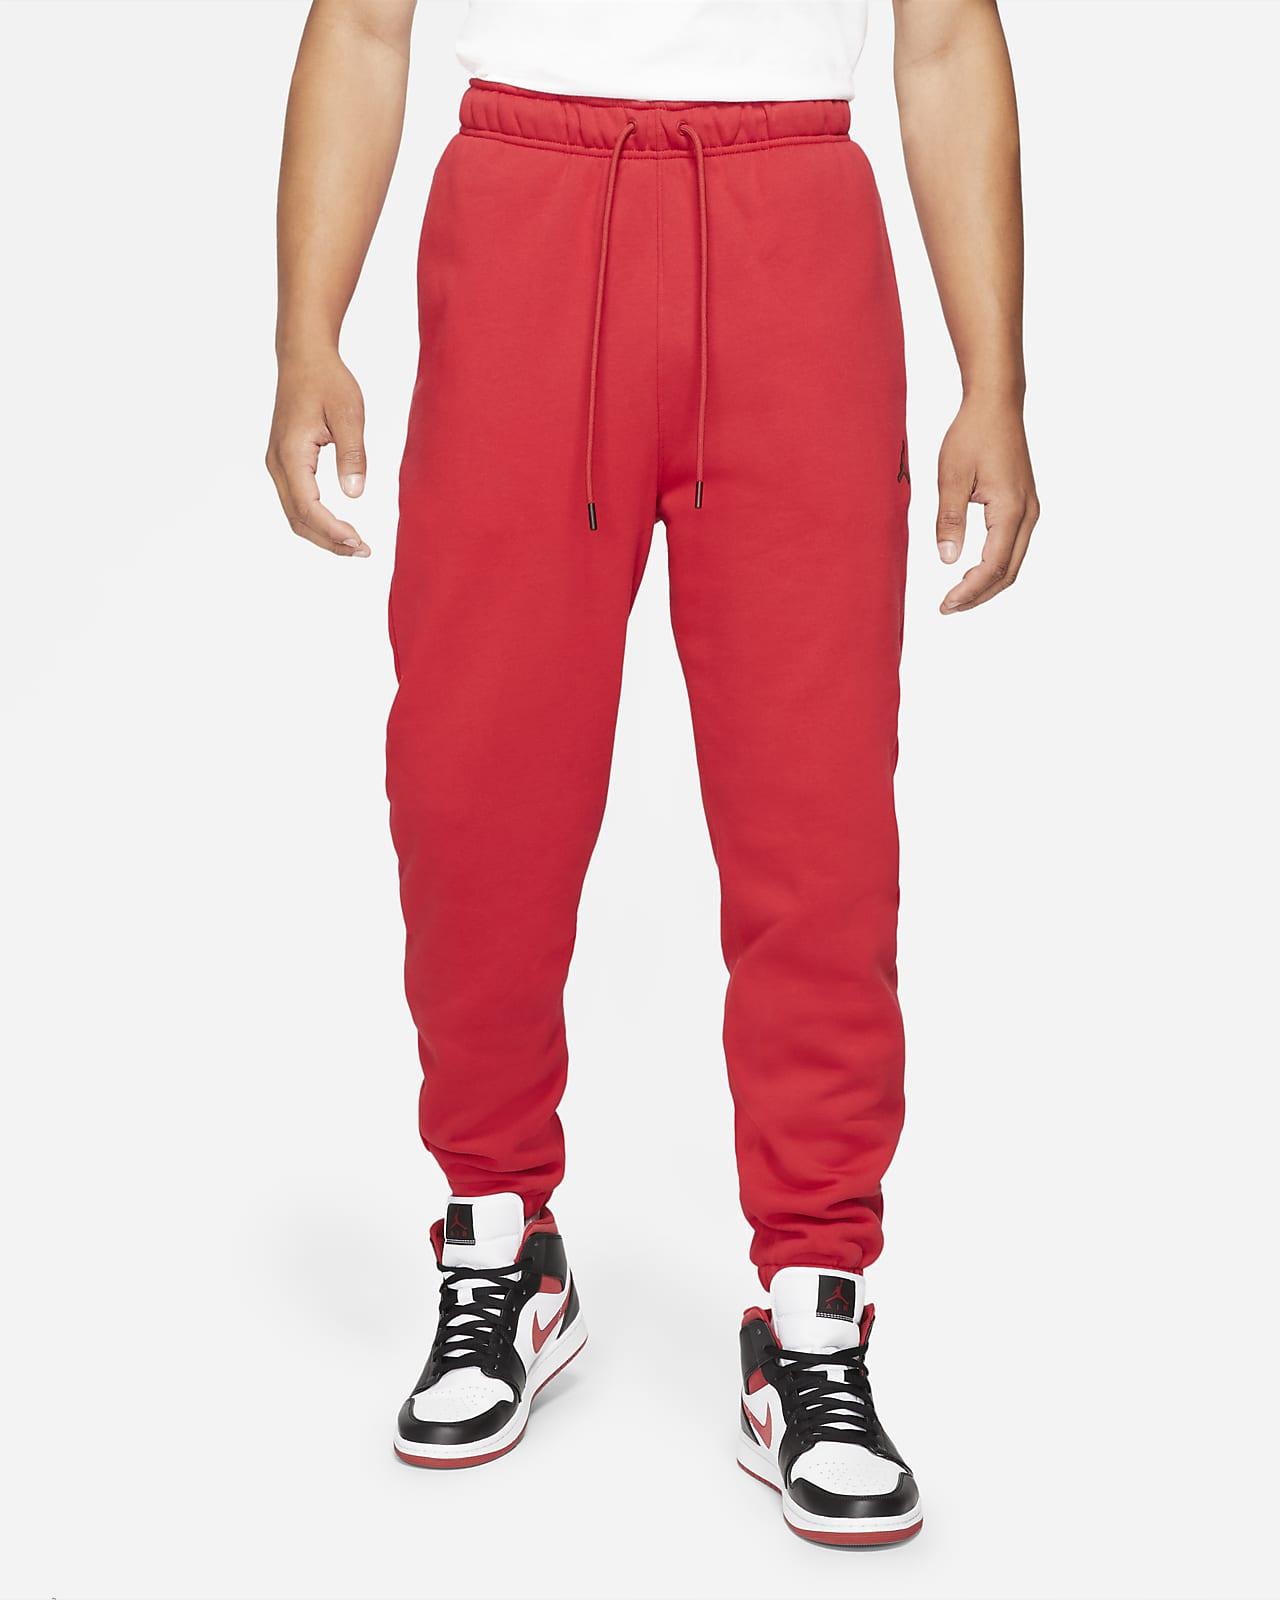 Pánské flísové kalhoty Jordan Essentials